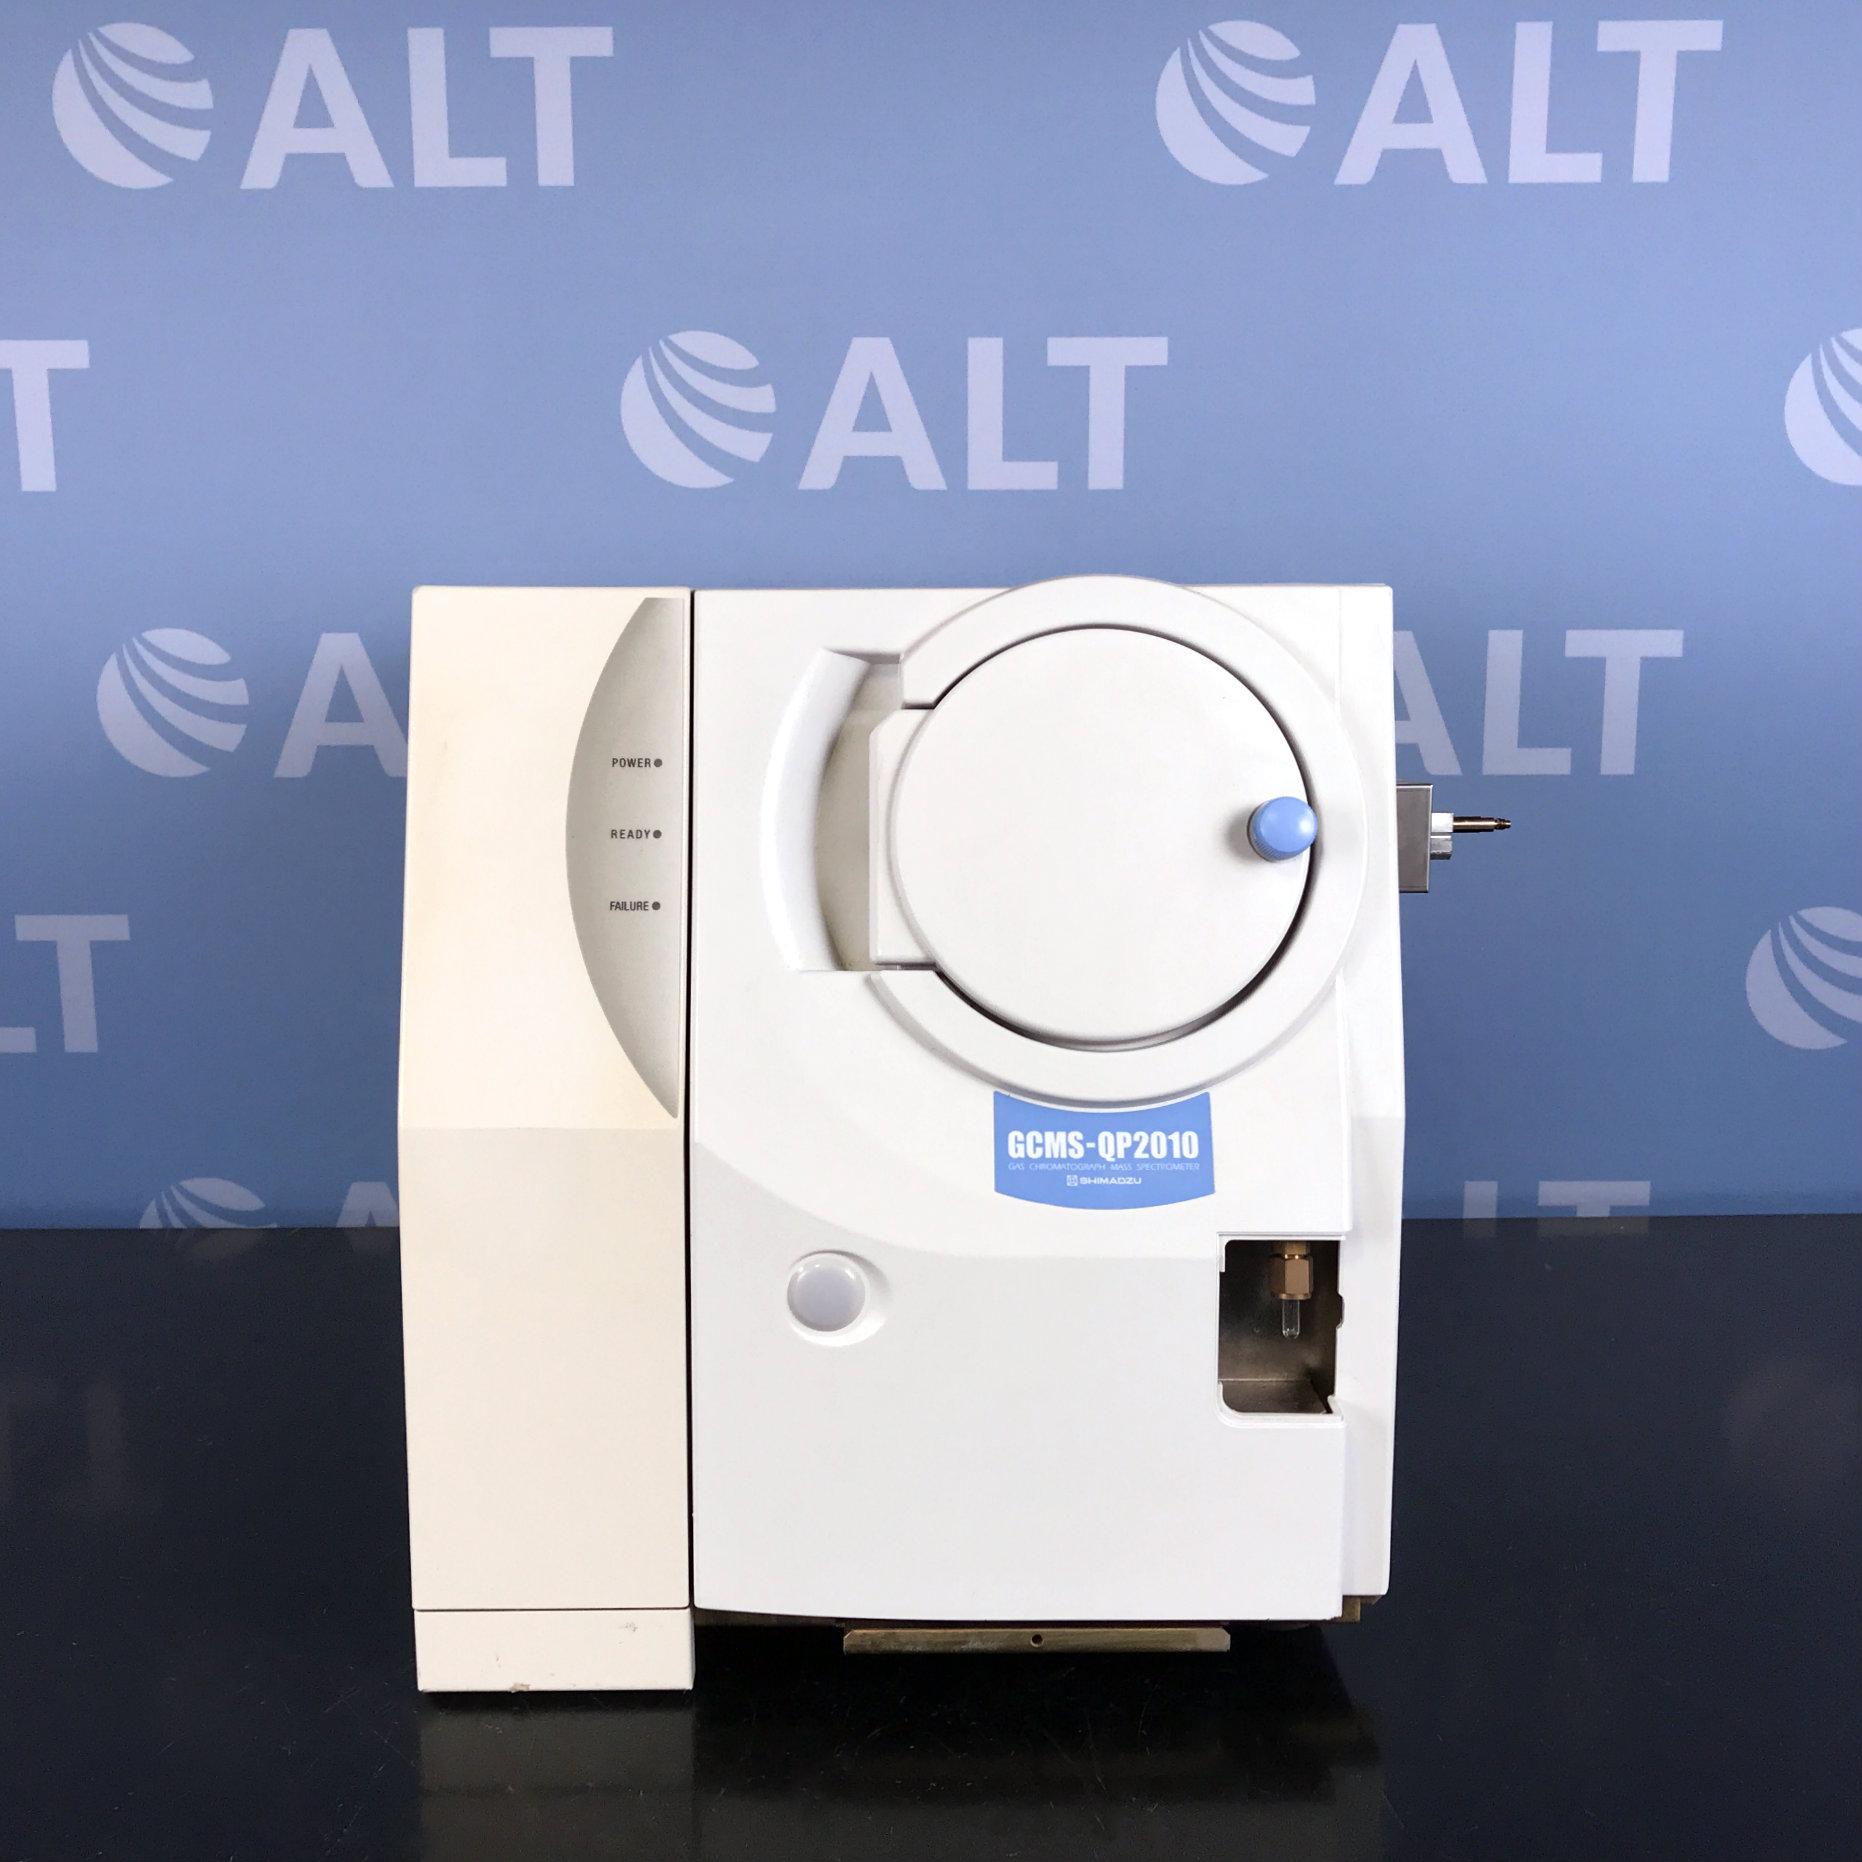 Shimadzu GCMS-QP2010 Gas Chromatograph Mass Spectrometer Image